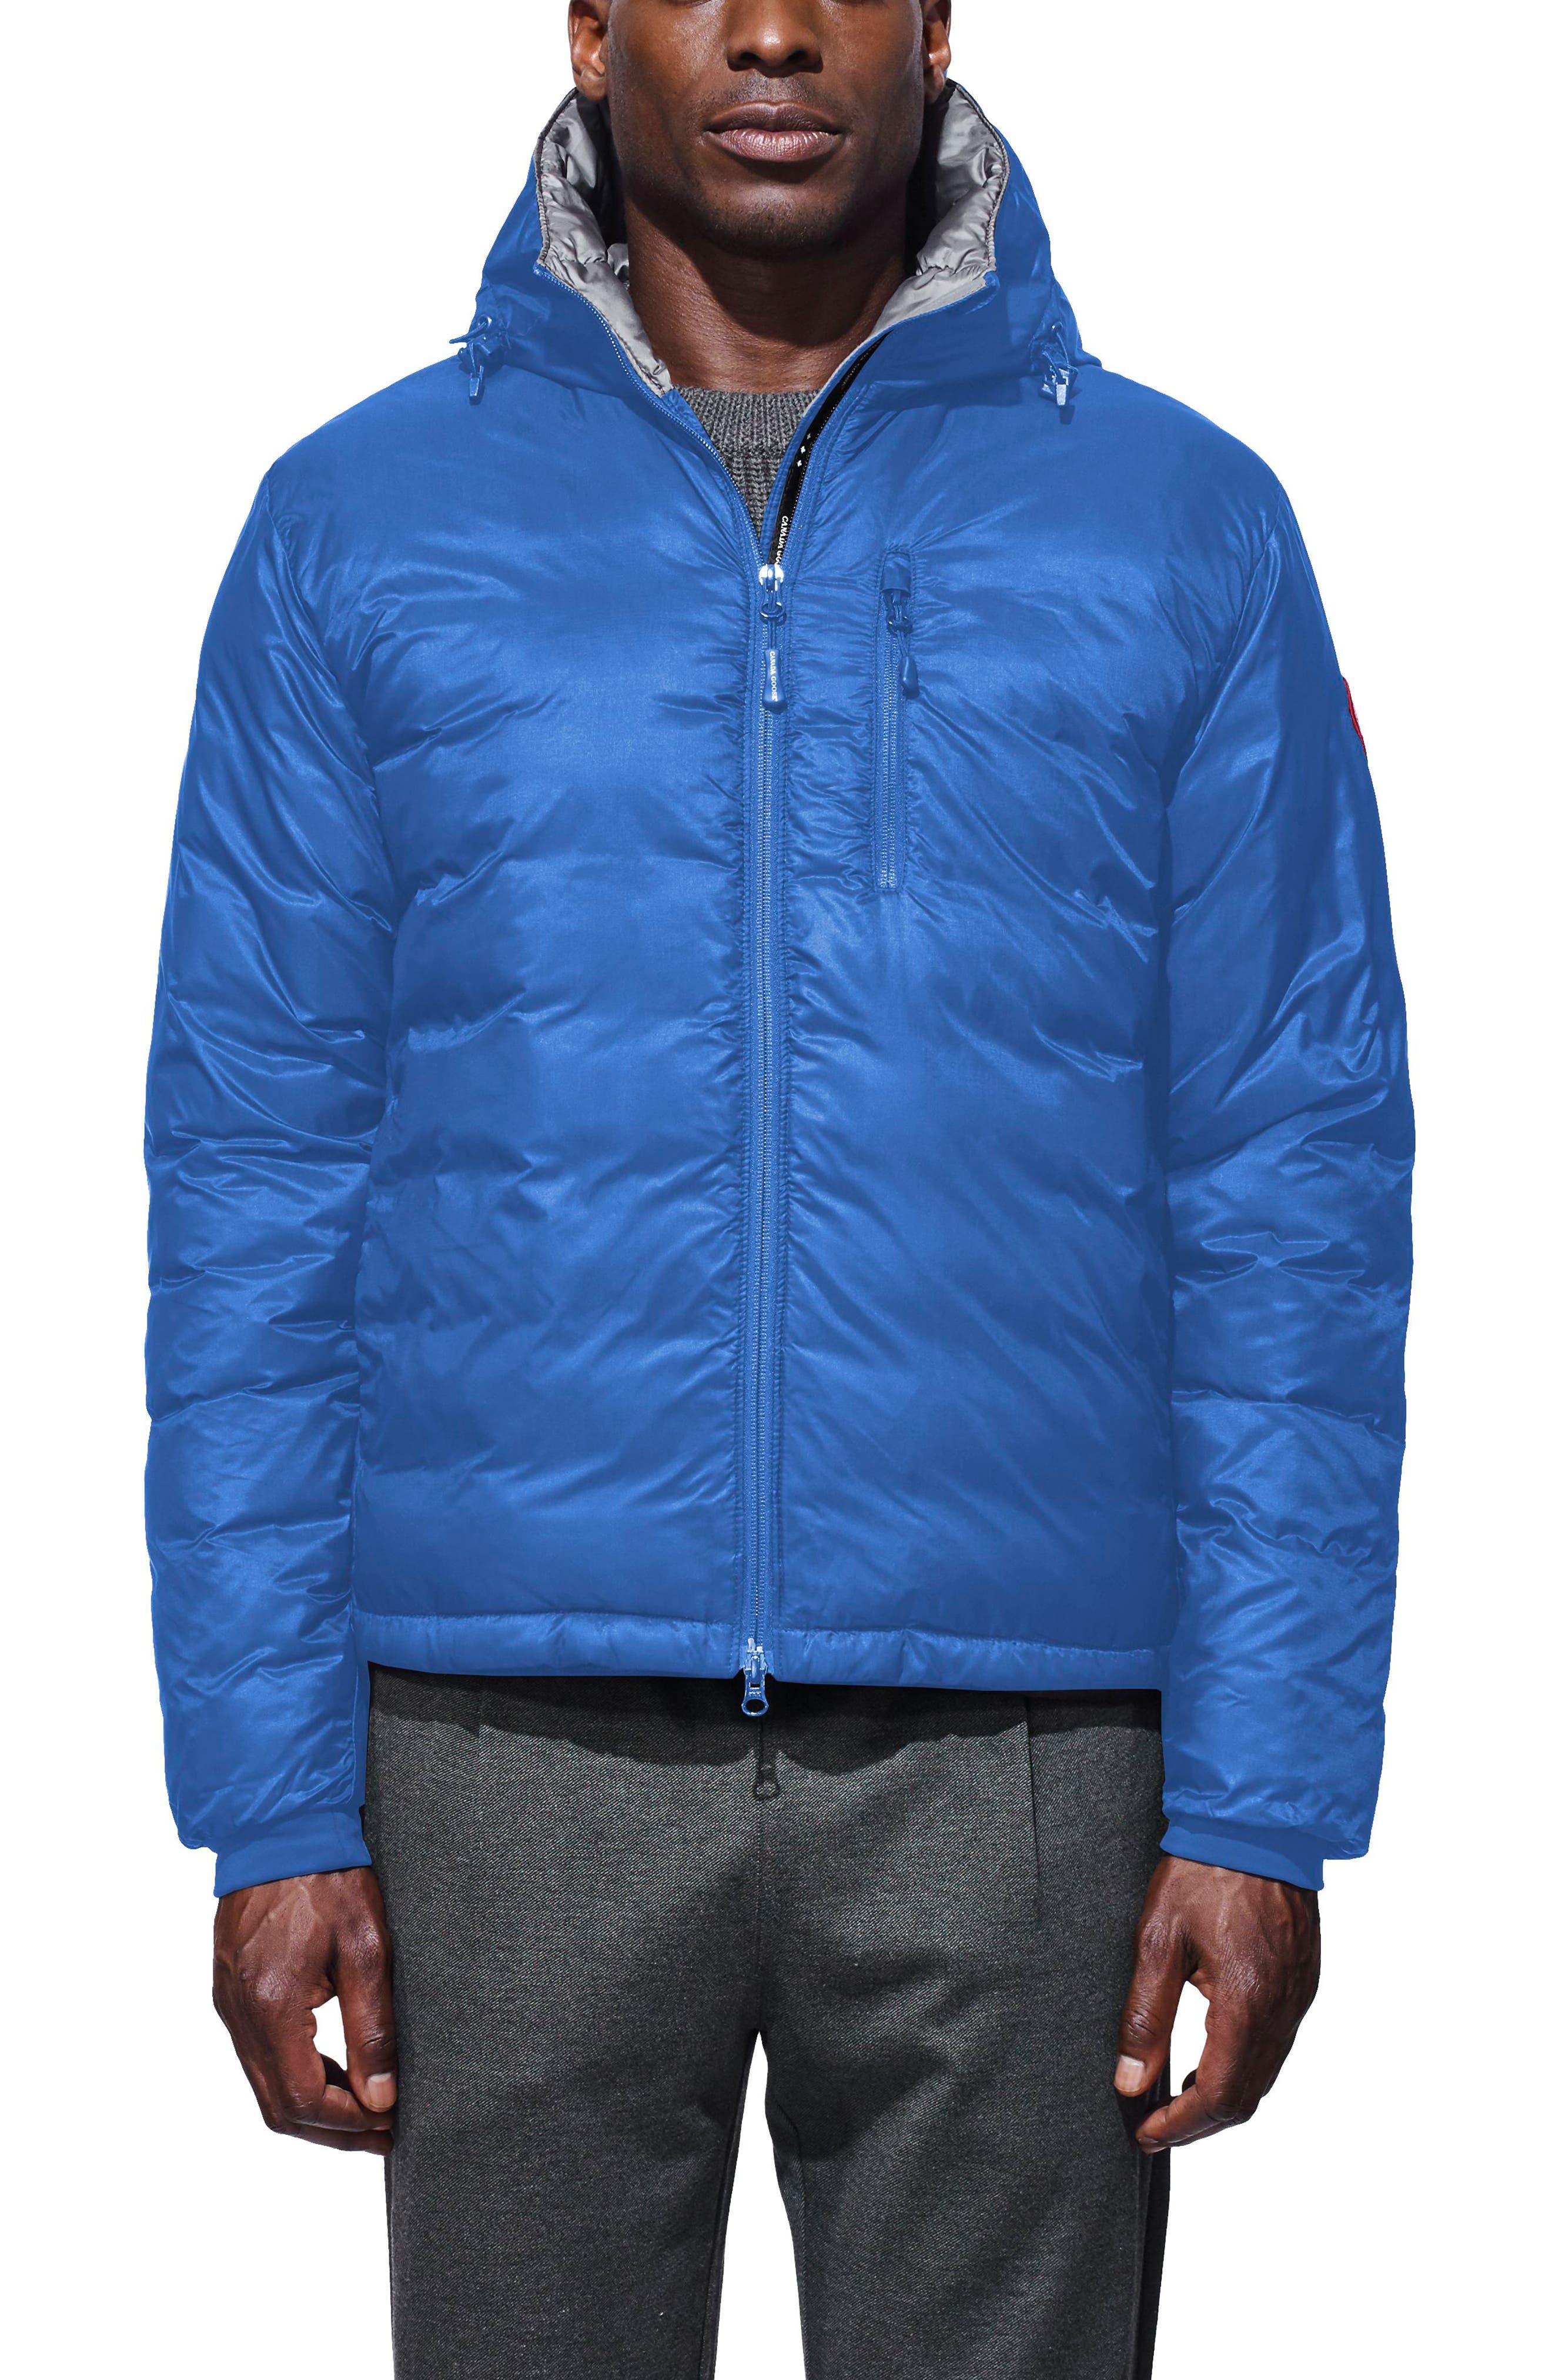 PBI Lodge Packable Down Hooded Jacket,                         Main,                         color, Royal Blue